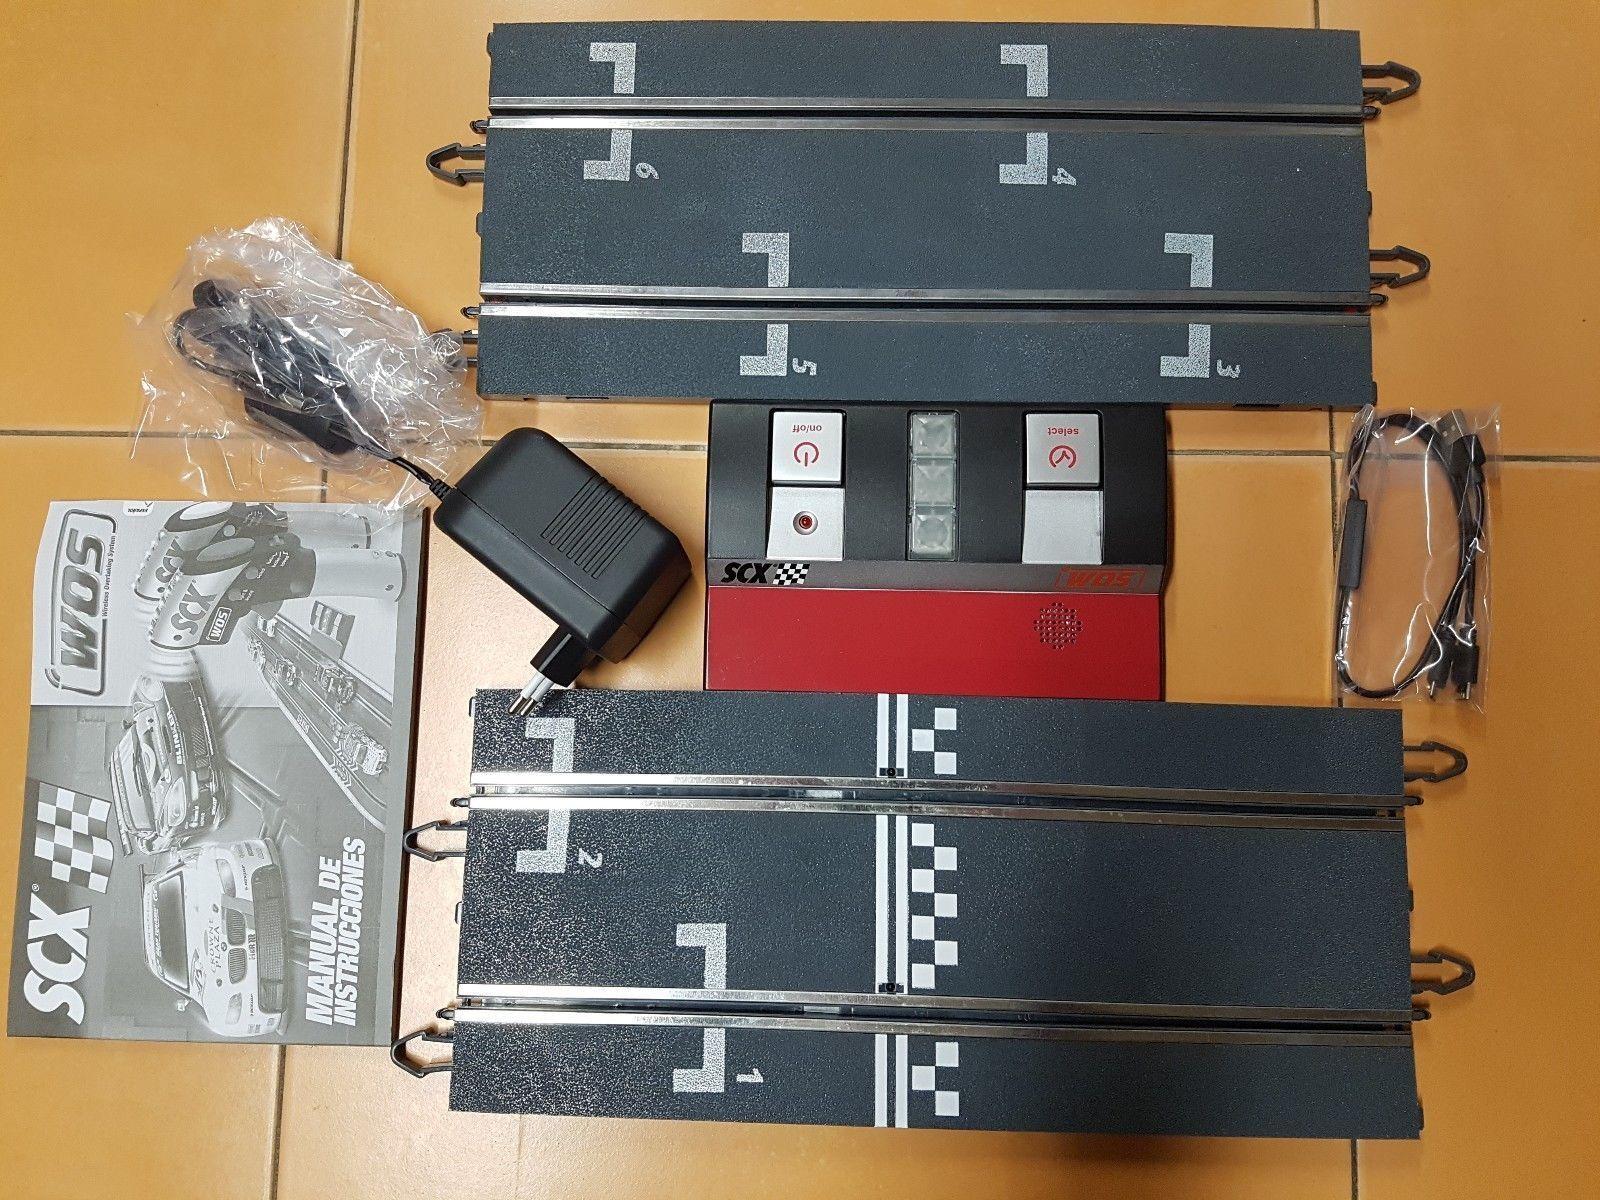 Das Bestee Angebot SCALEXTRIC WOS POWER BASE CENTRAL + Transformator Transformator Transformator 1/32 Neu b4e5df